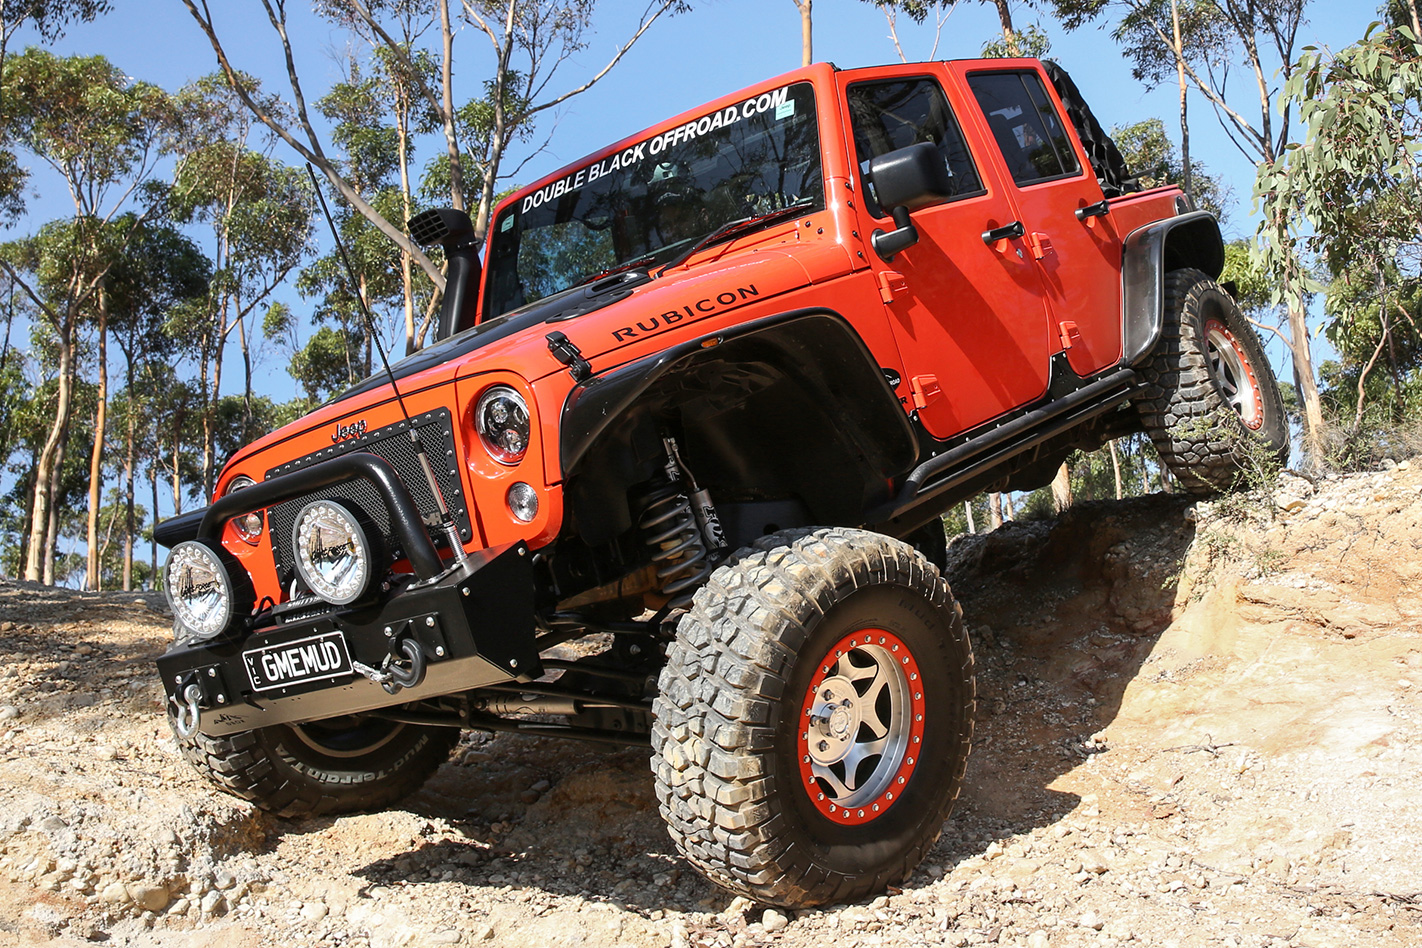 2015 Jeep JK Unlimited Wrangler Rubicon video offroad